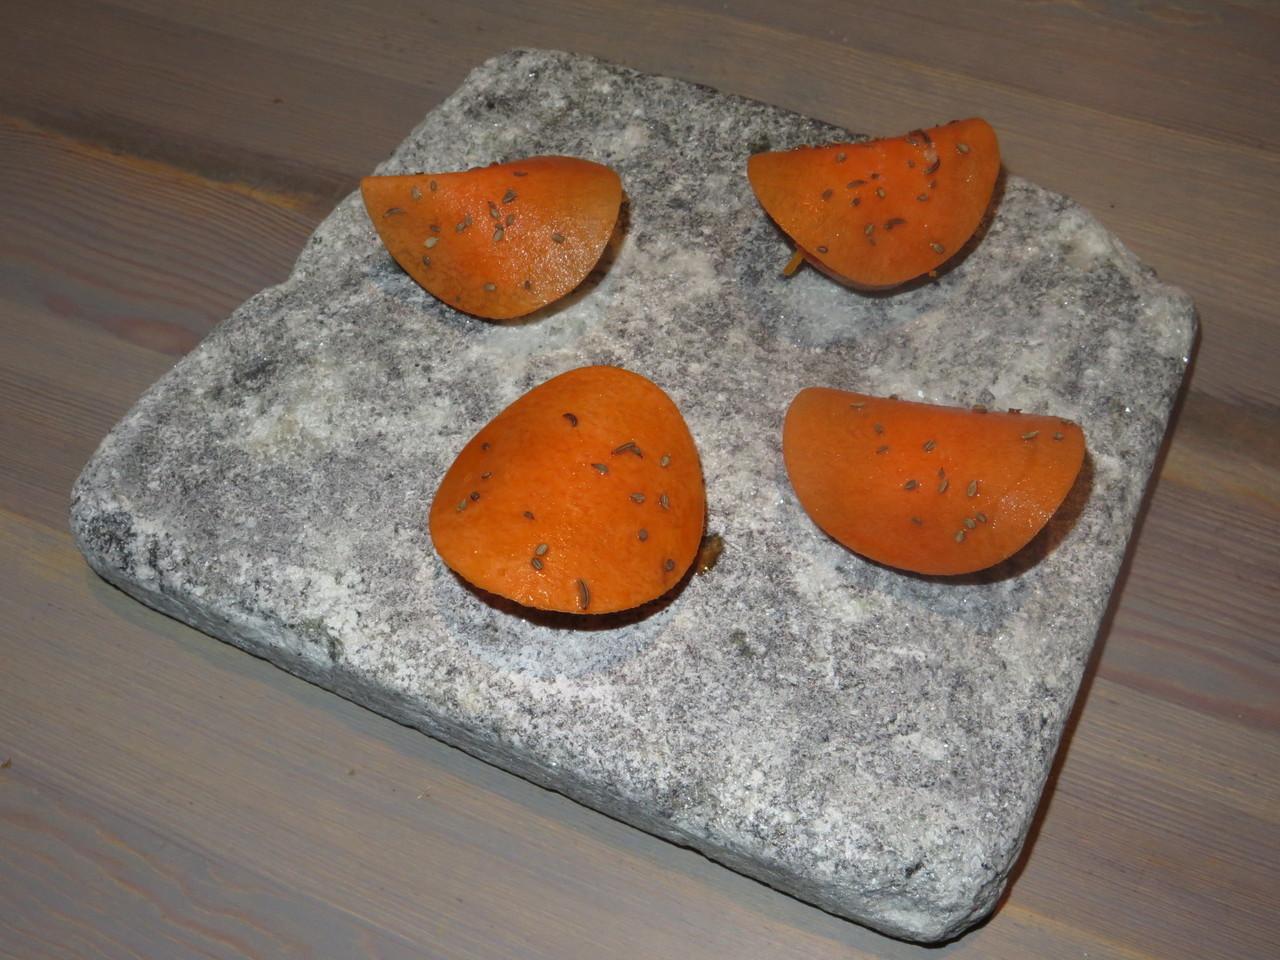 Wholegrain wheat cracker with carrot salad